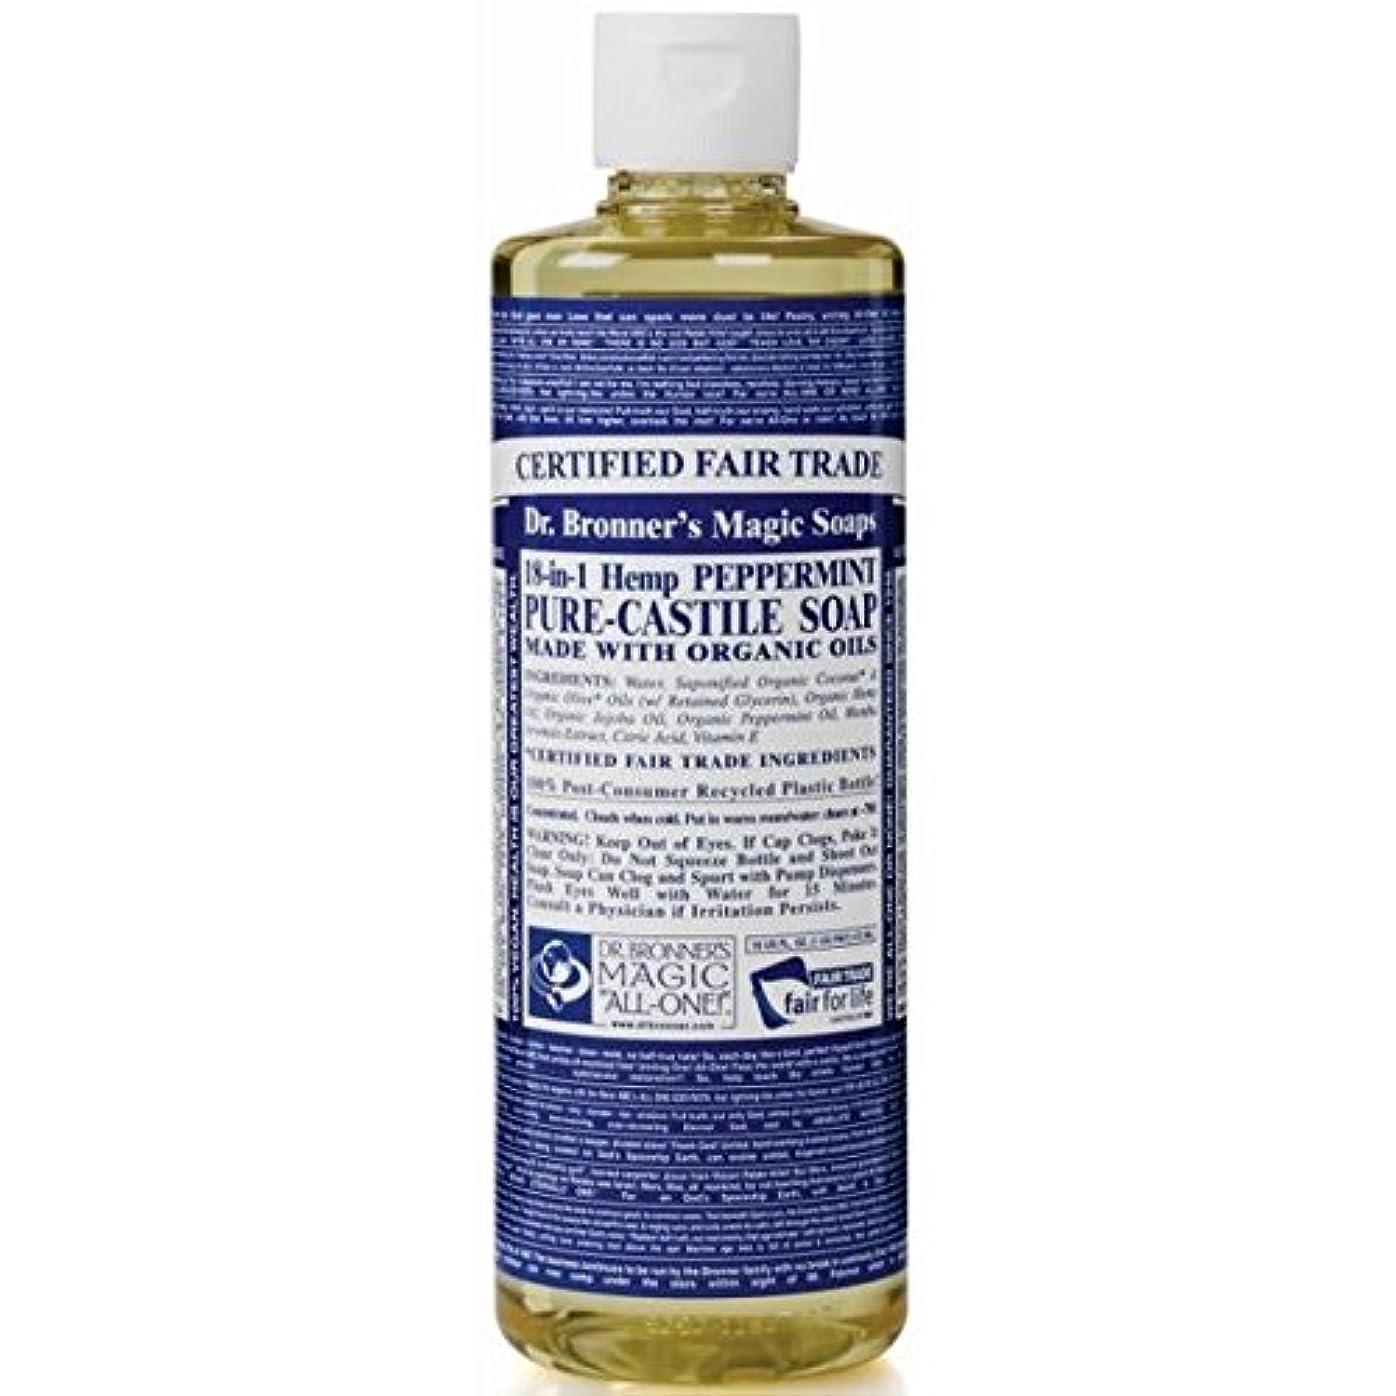 Dr Bronner Organic Peppermint Castile Liquid Soap 237ml (Pack of 6) - のブロナー有機ペパーミントカスティーリャ液体石鹸237ミリリットル x6 [並行輸入品]